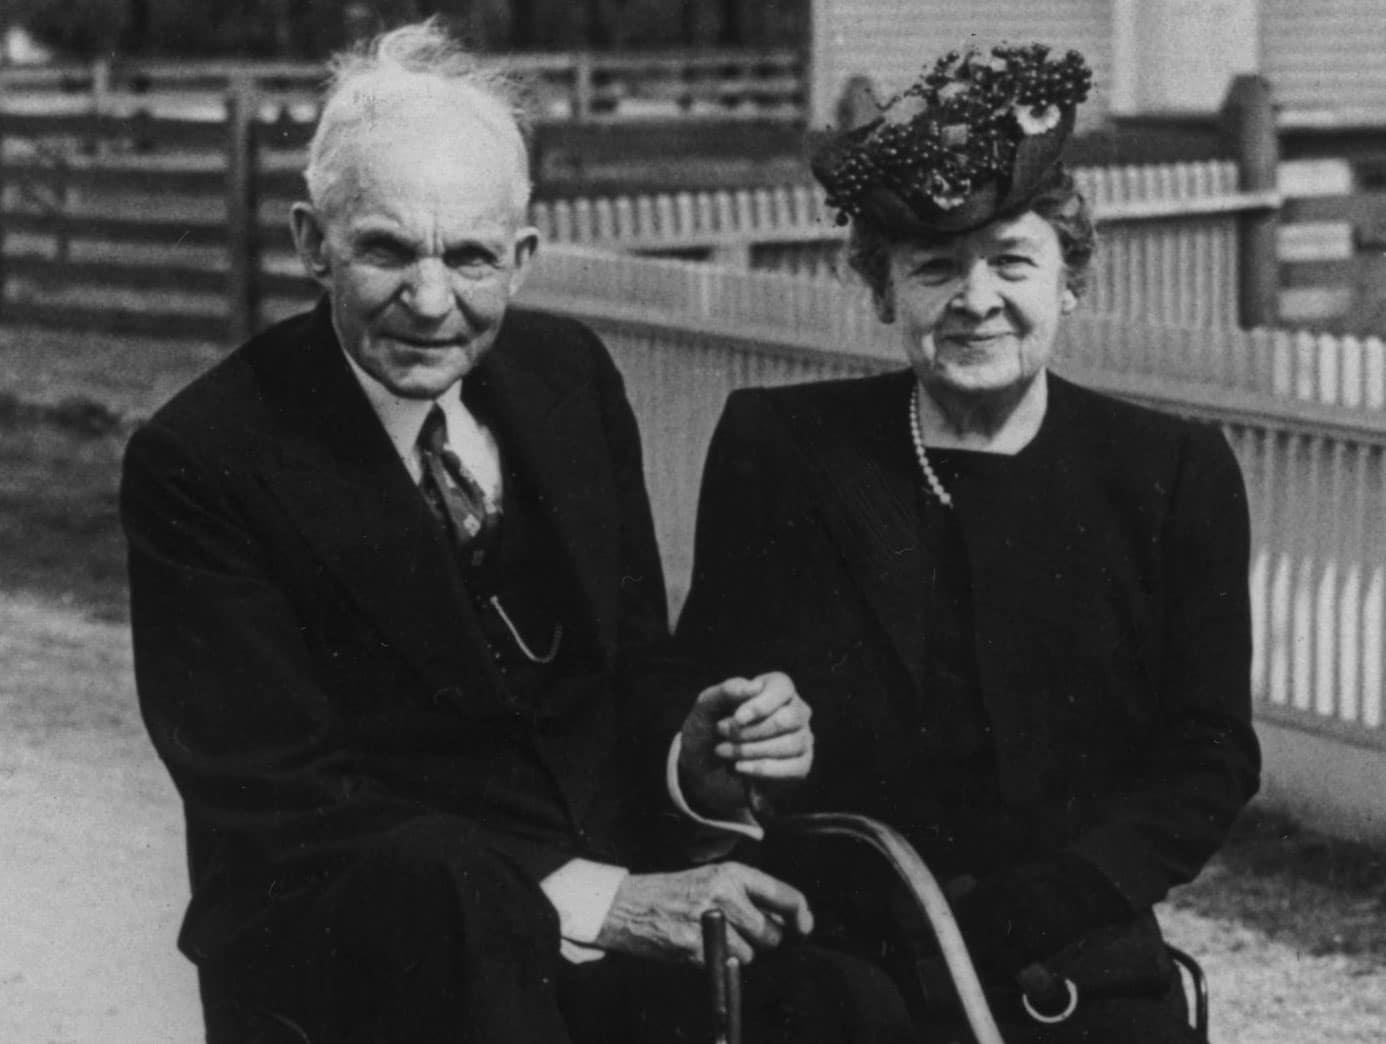 Генри Форд с Кларой Брайан